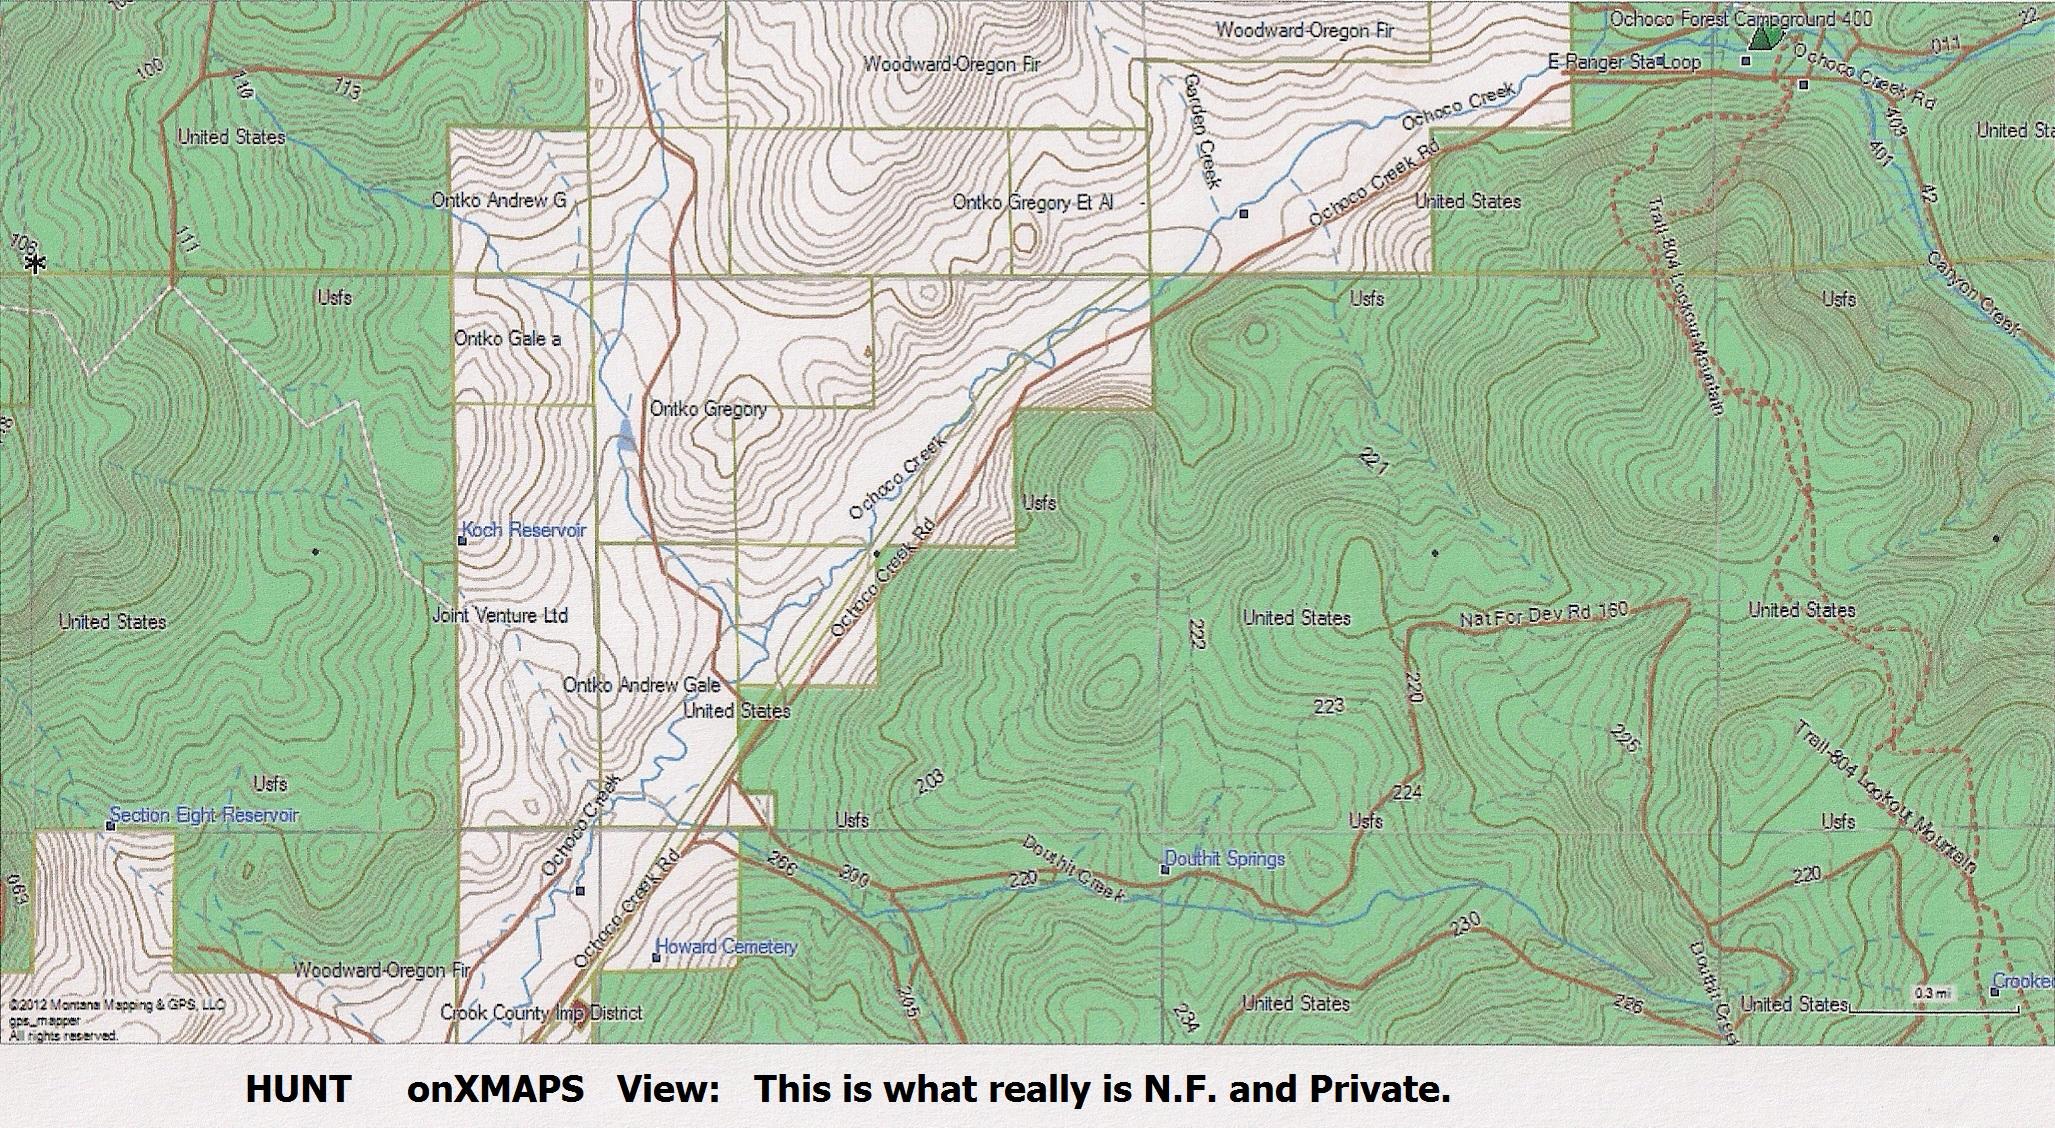 100 Hunting Gps Maps Gaia Gps Not Your Average Smart Phone Gps App Bik